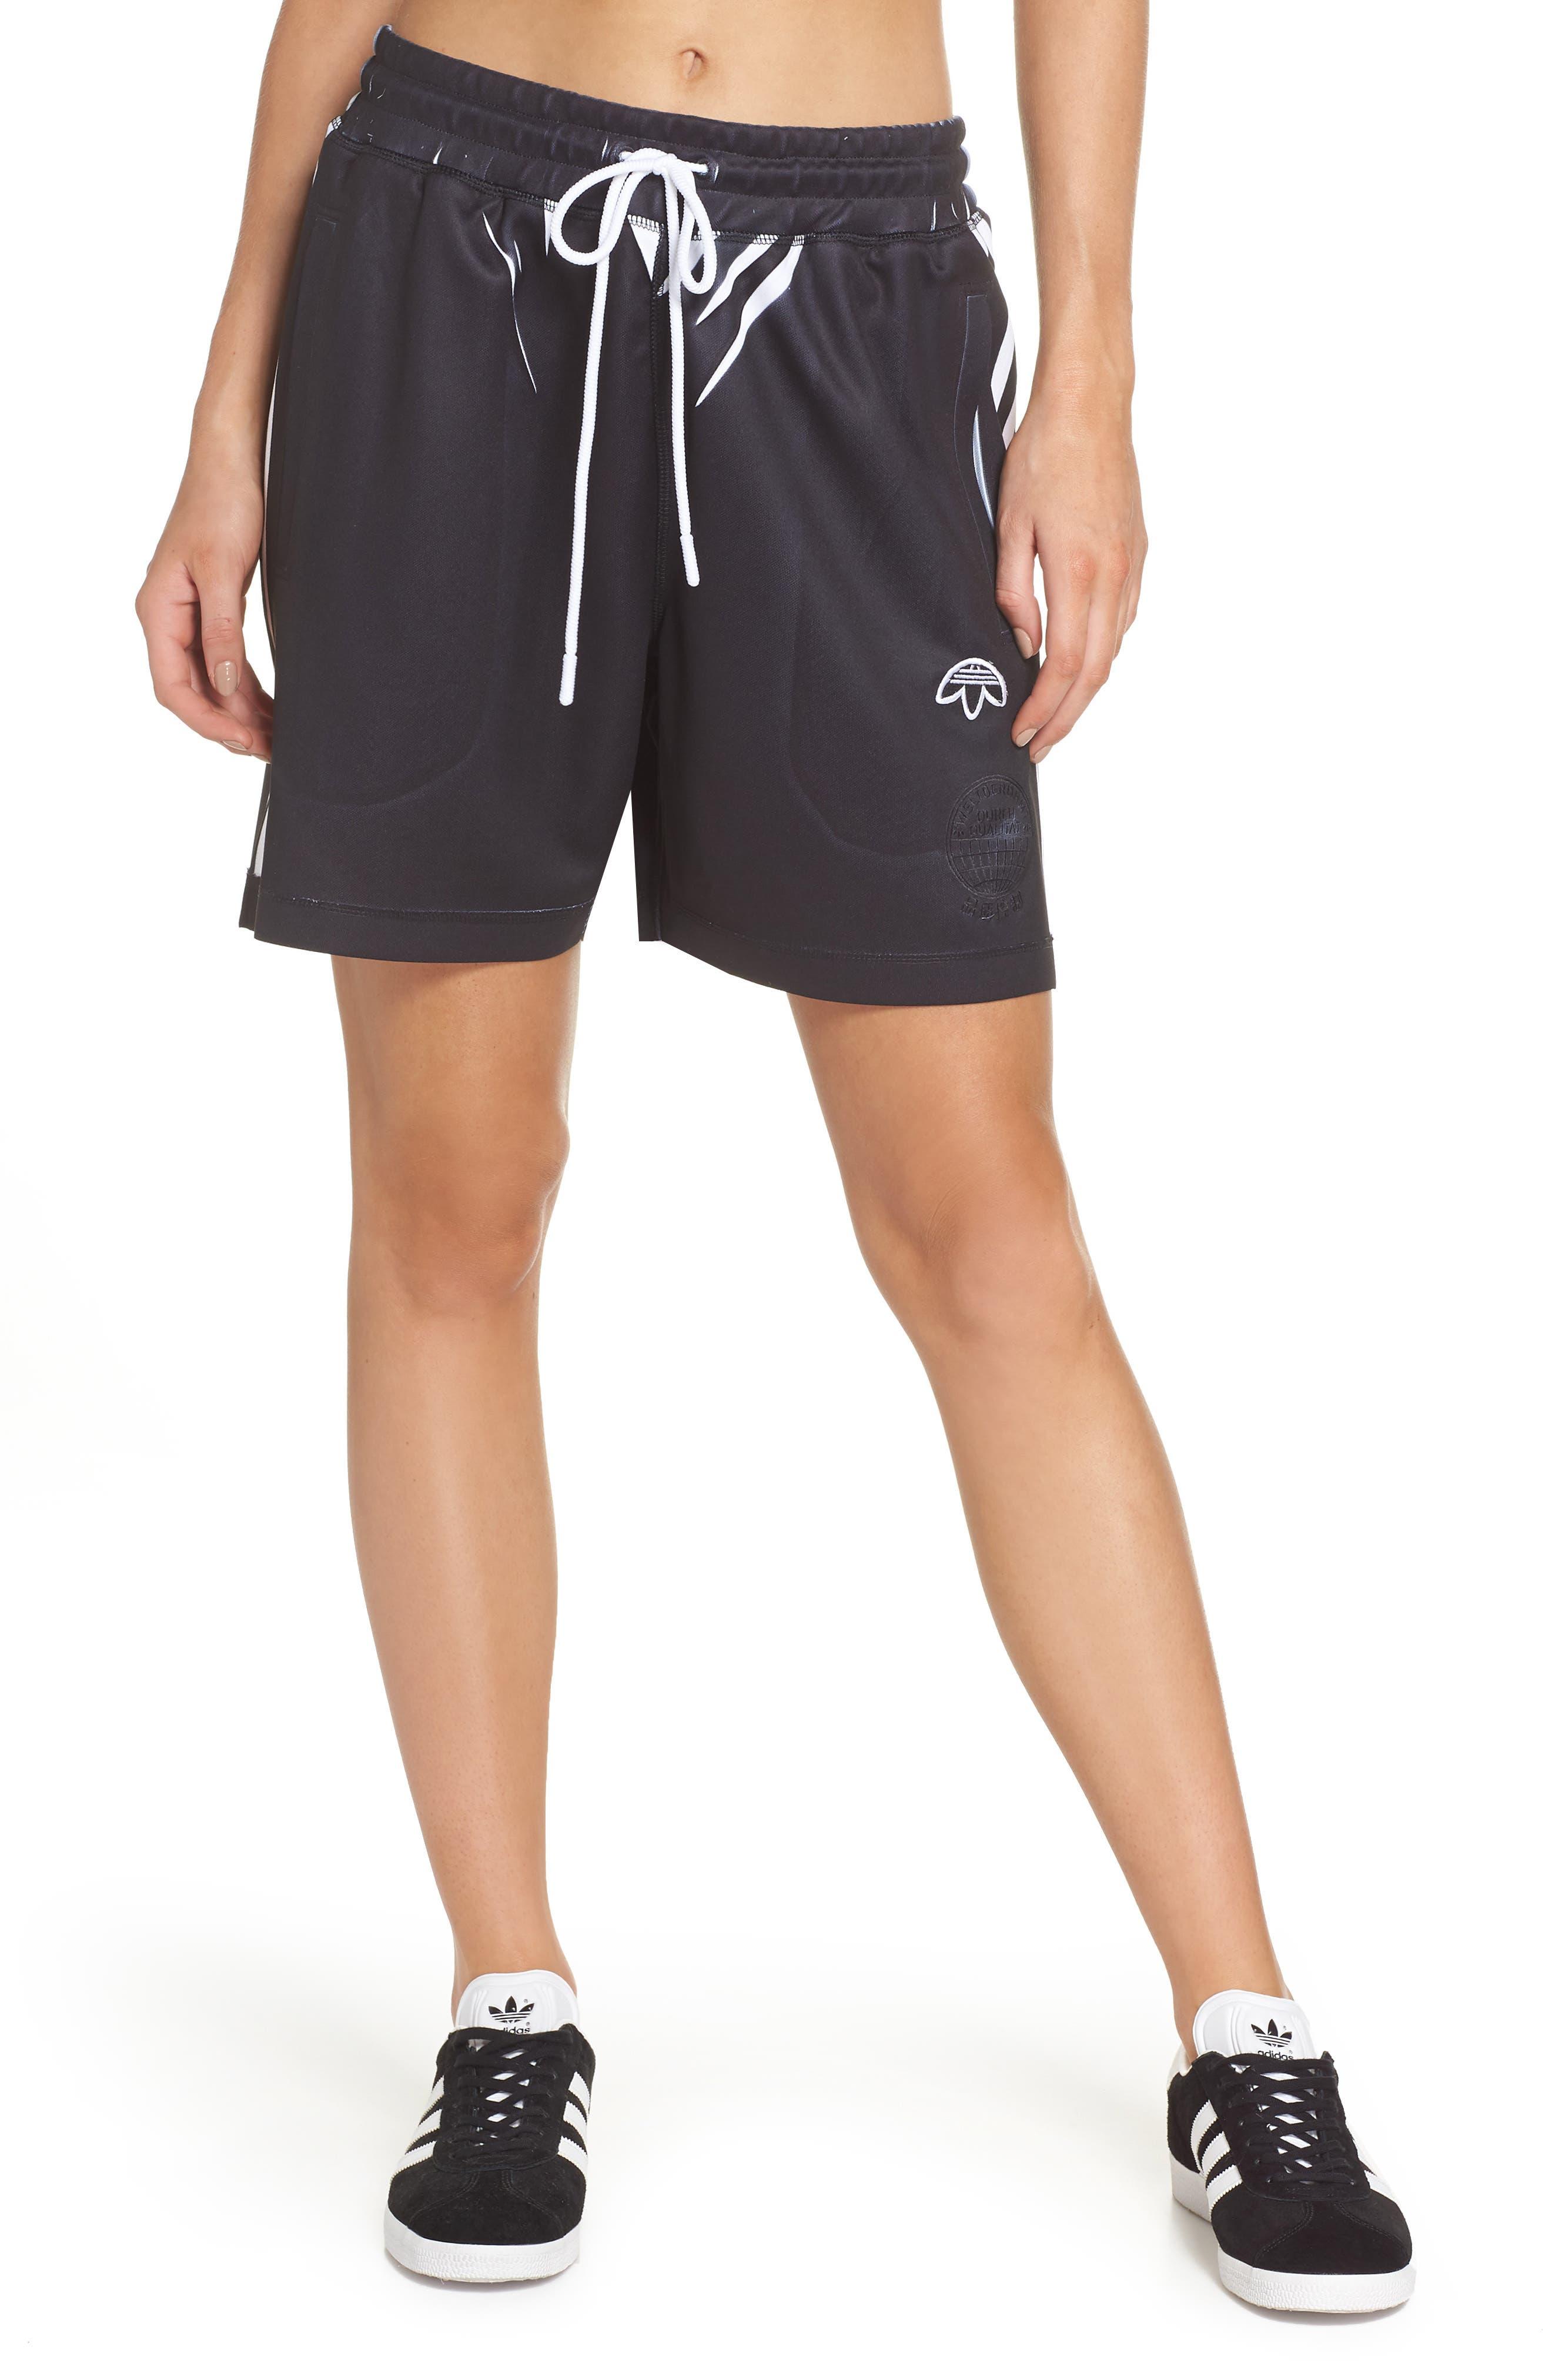 Shorts,                         Main,                         color, Black/ White